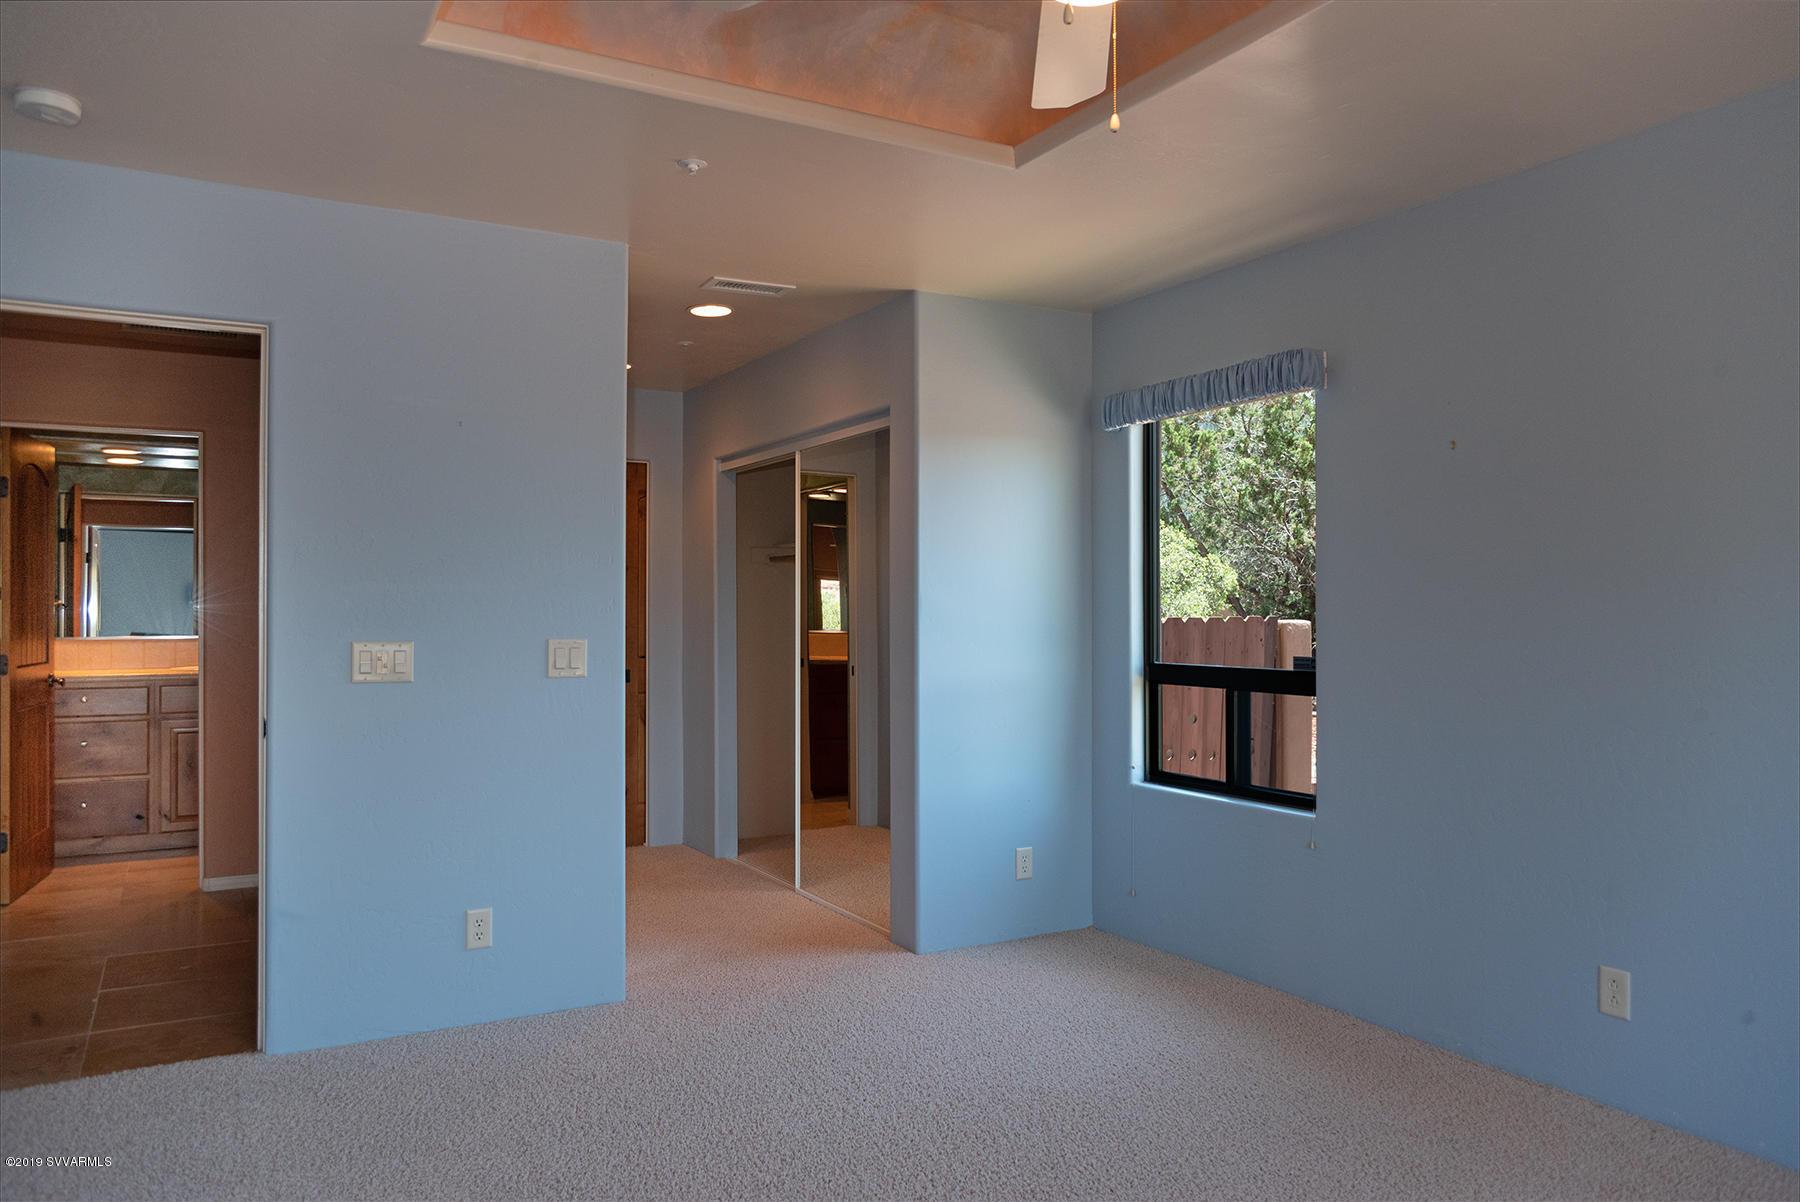 70 Veritas Drive Sedona, AZ 86351